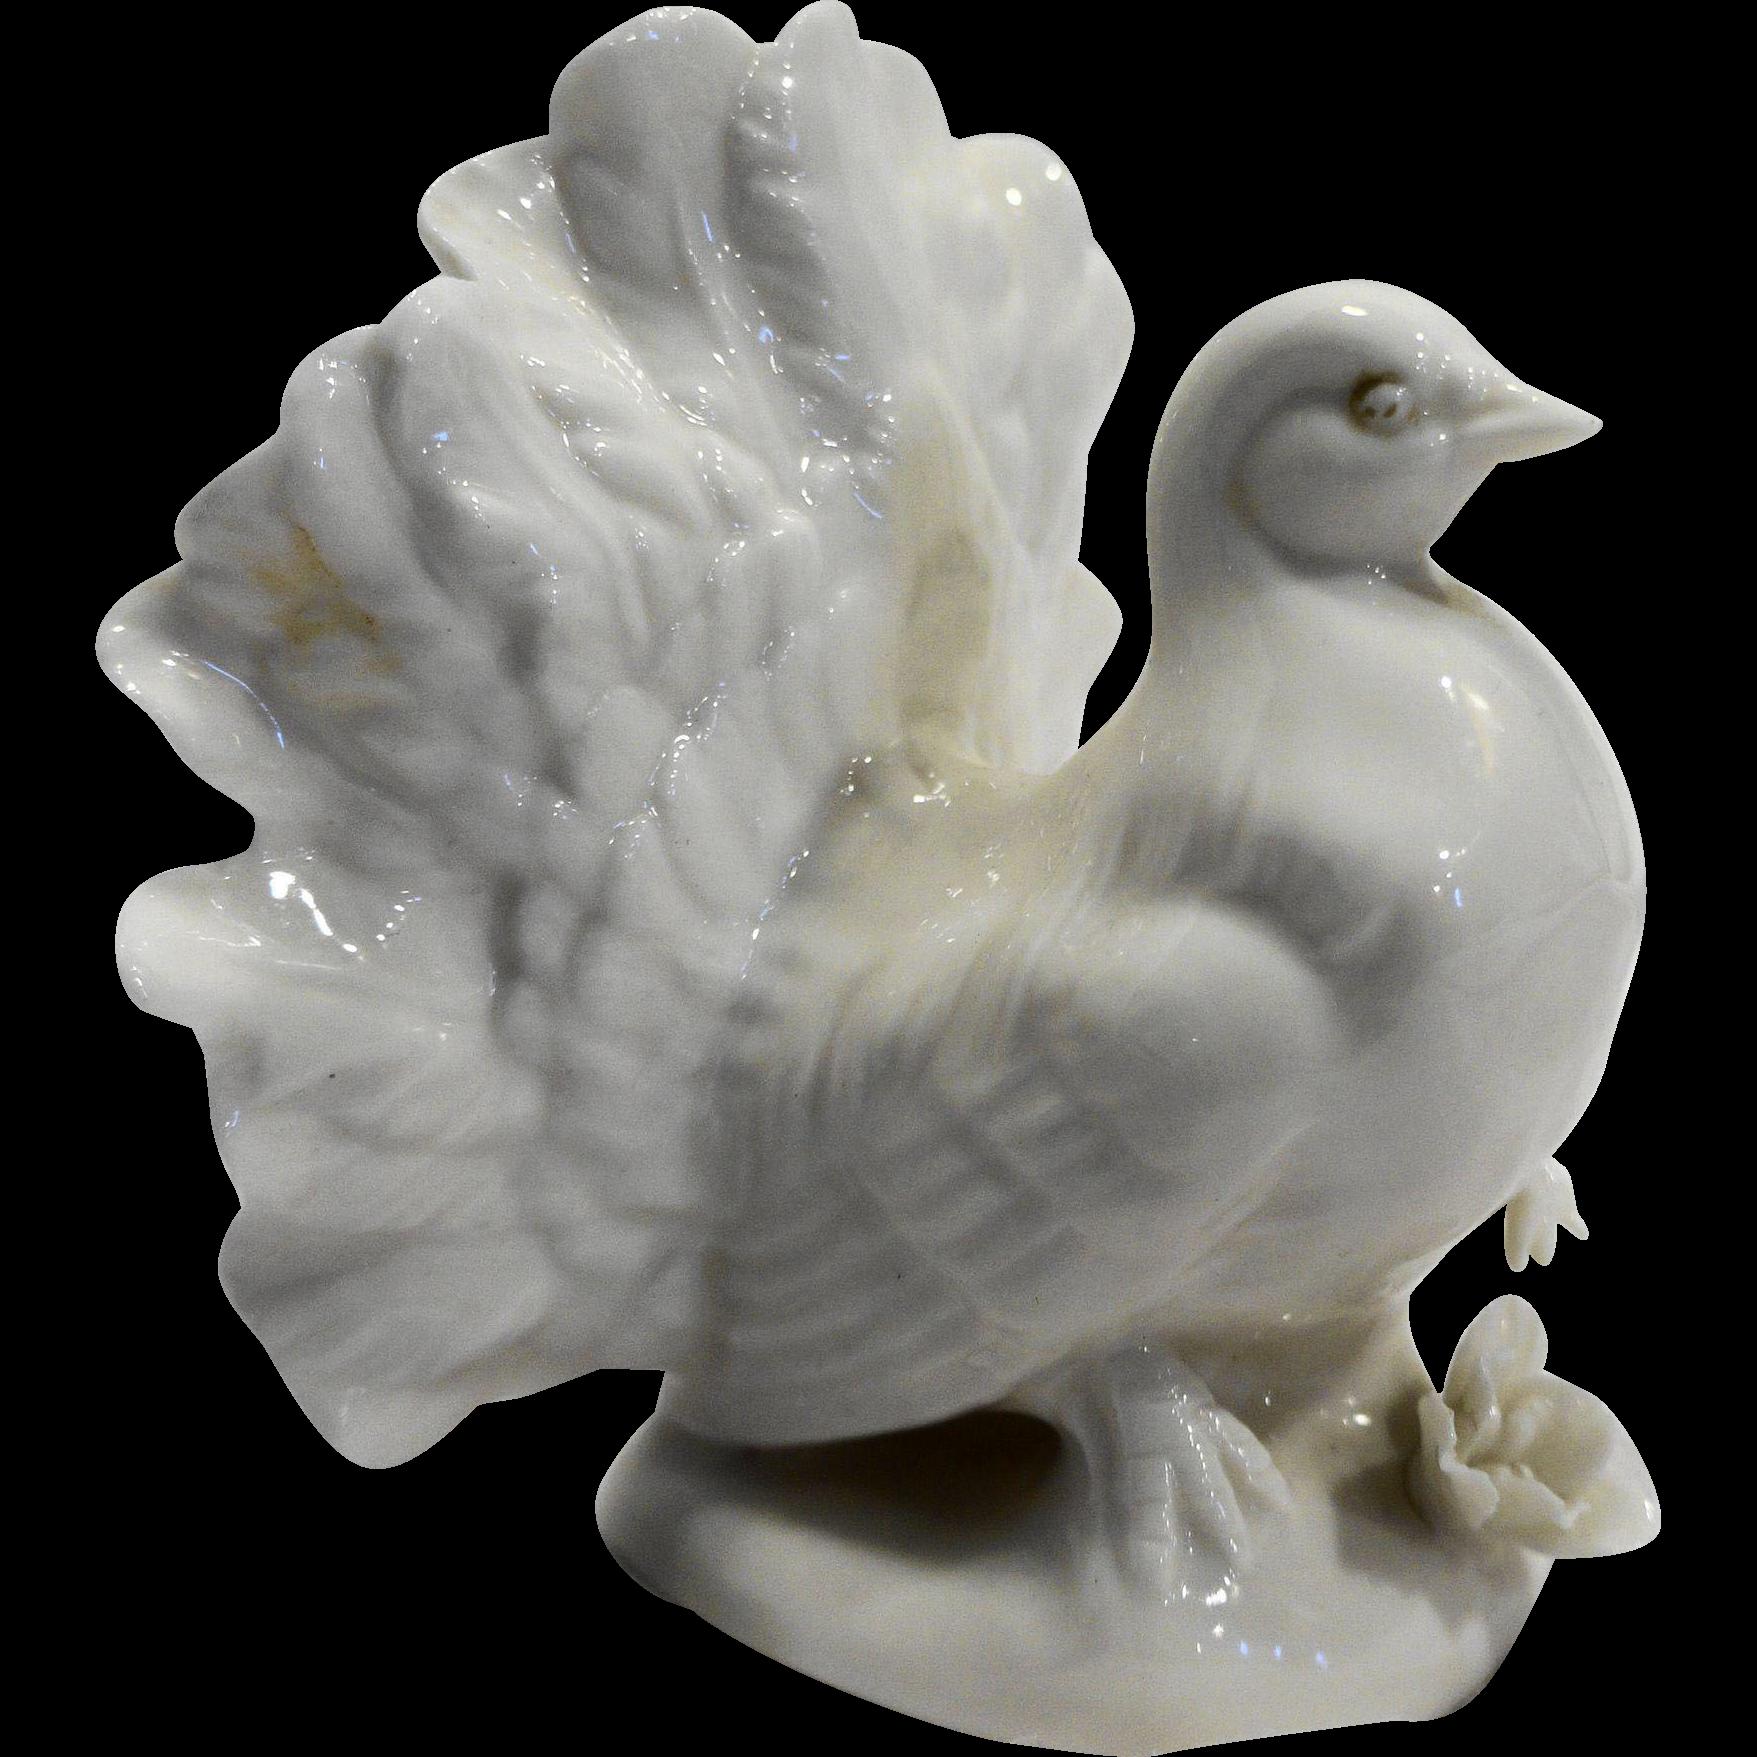 Lenwile Ardalt Japan Verithin White Porcelain Fine China Turkey Figurine